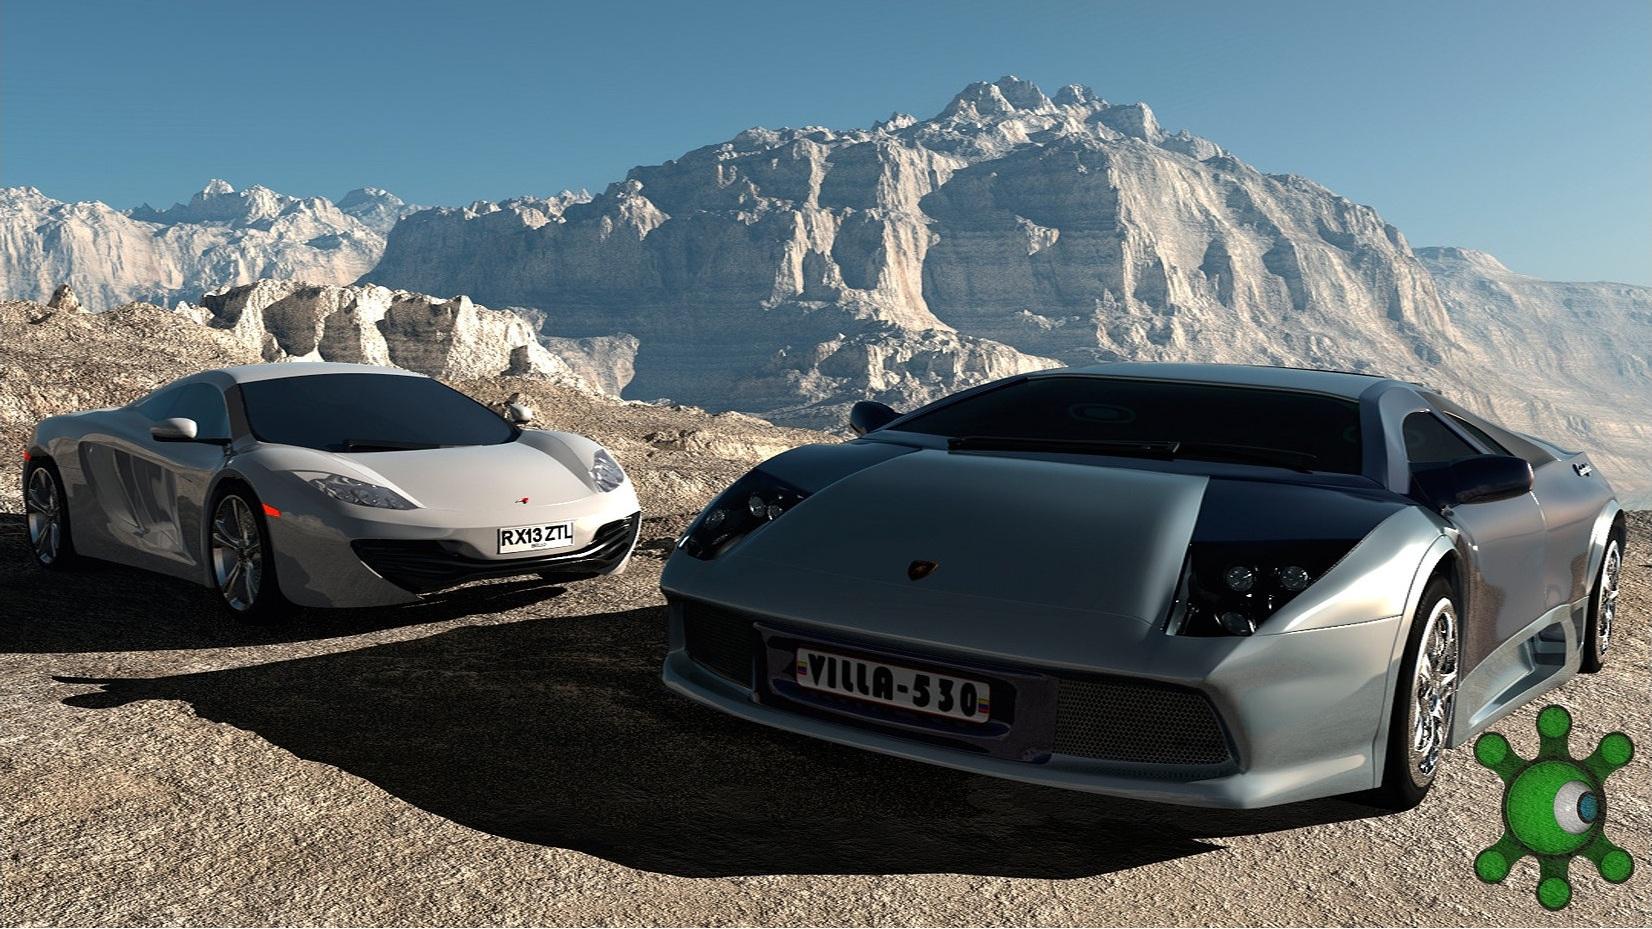 Lamborghini Murciélago Mclaren